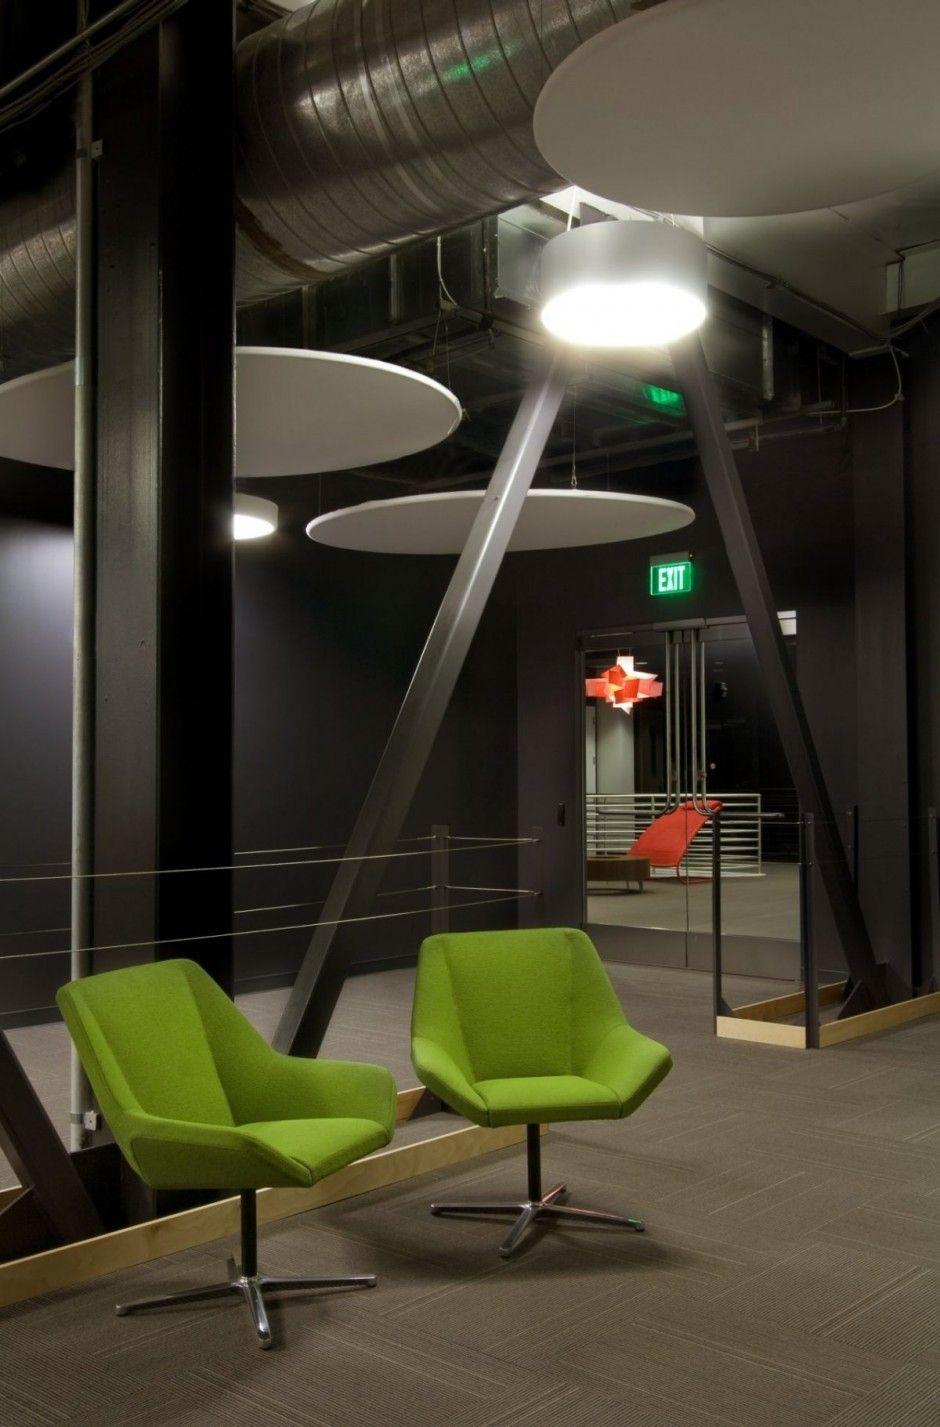 Skype S North American Headquarters By Blitz Pinterest # Muebles Dico Power Center